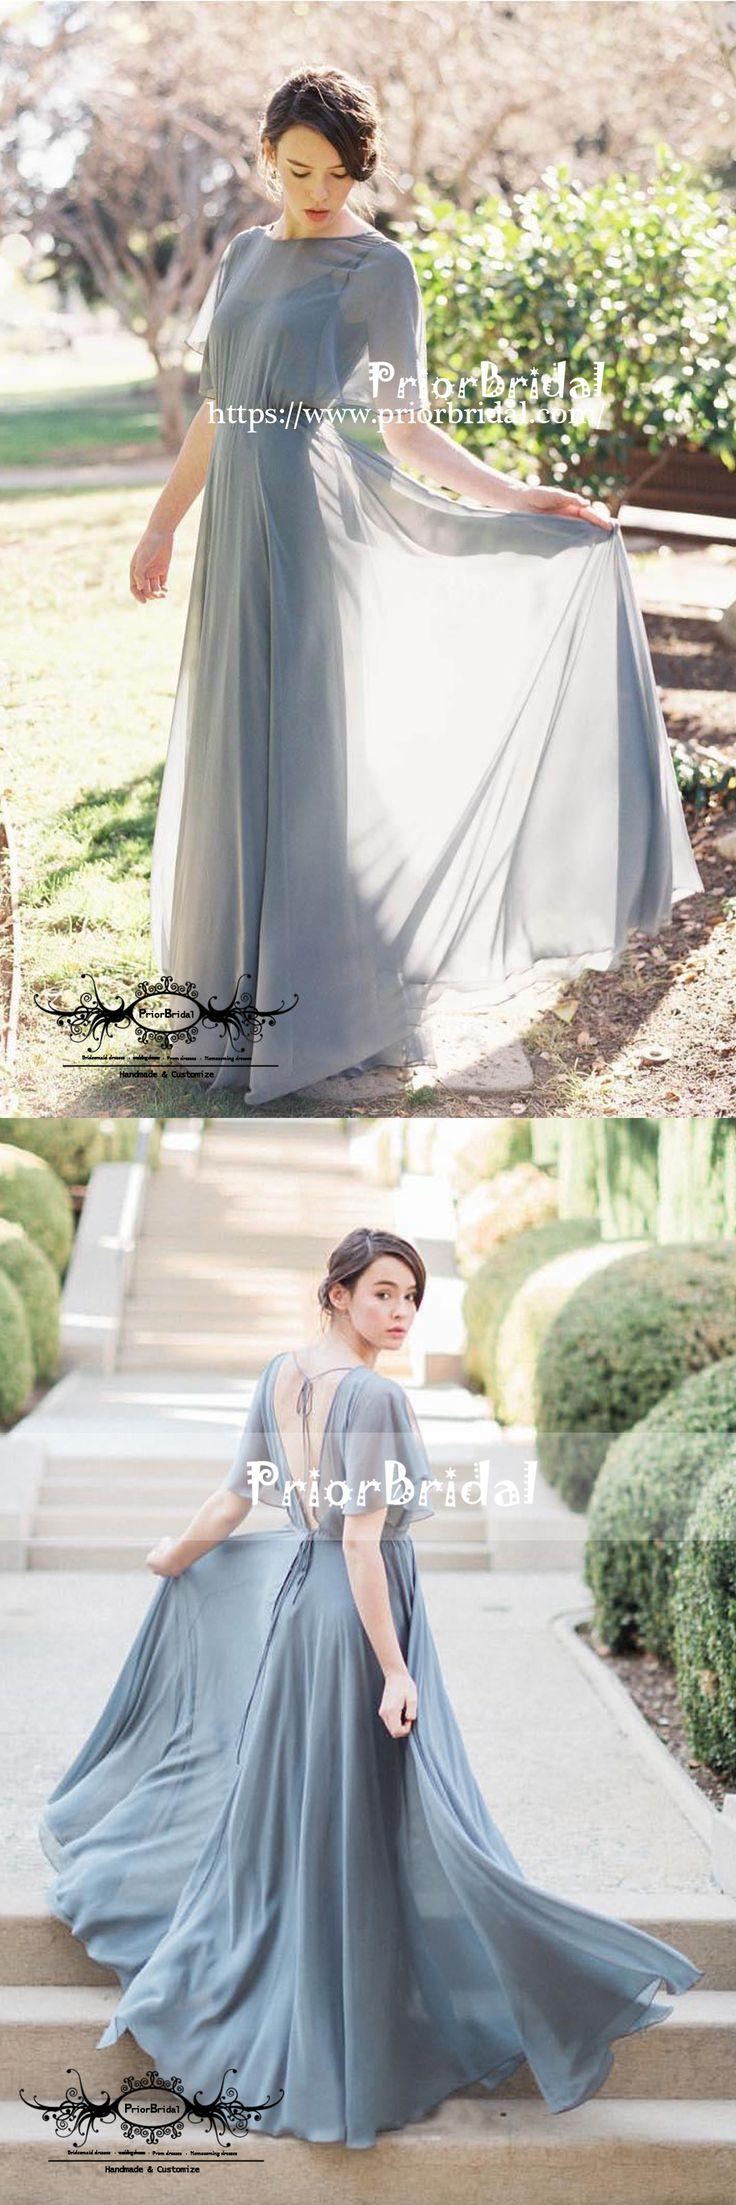 59 best Bridesmaid Dresses images on Pinterest | Weddings, Flower ...